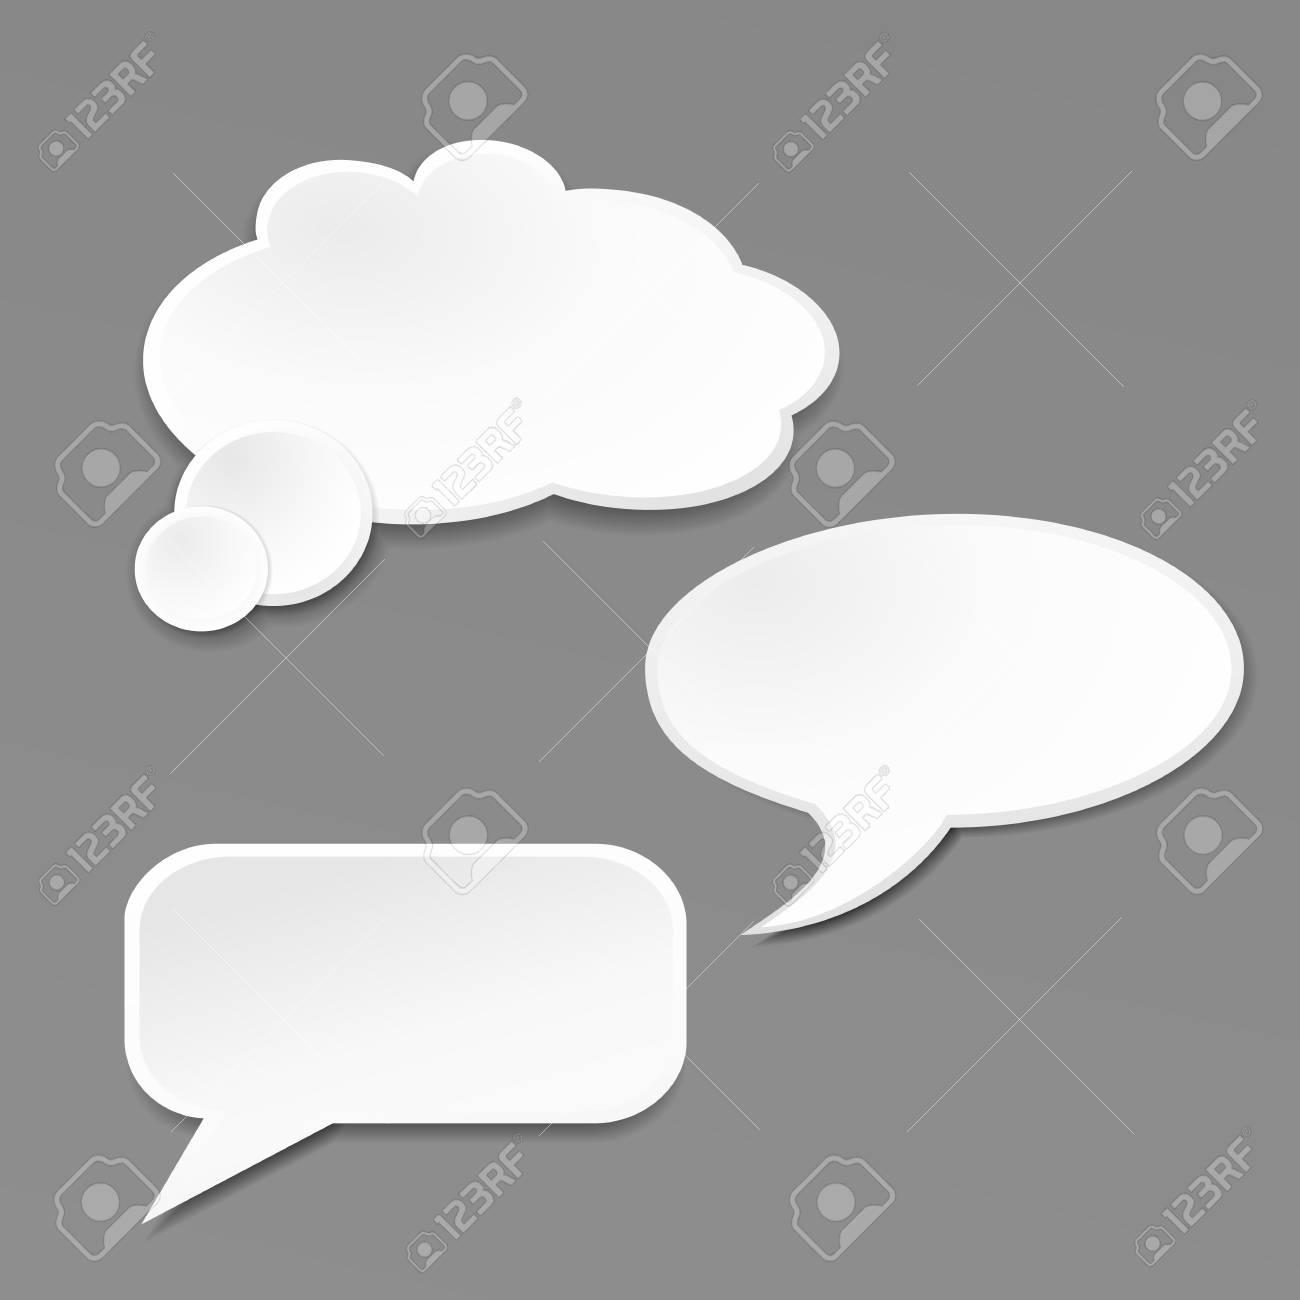 Speech bubble on grey background Stock Vector - 20442242